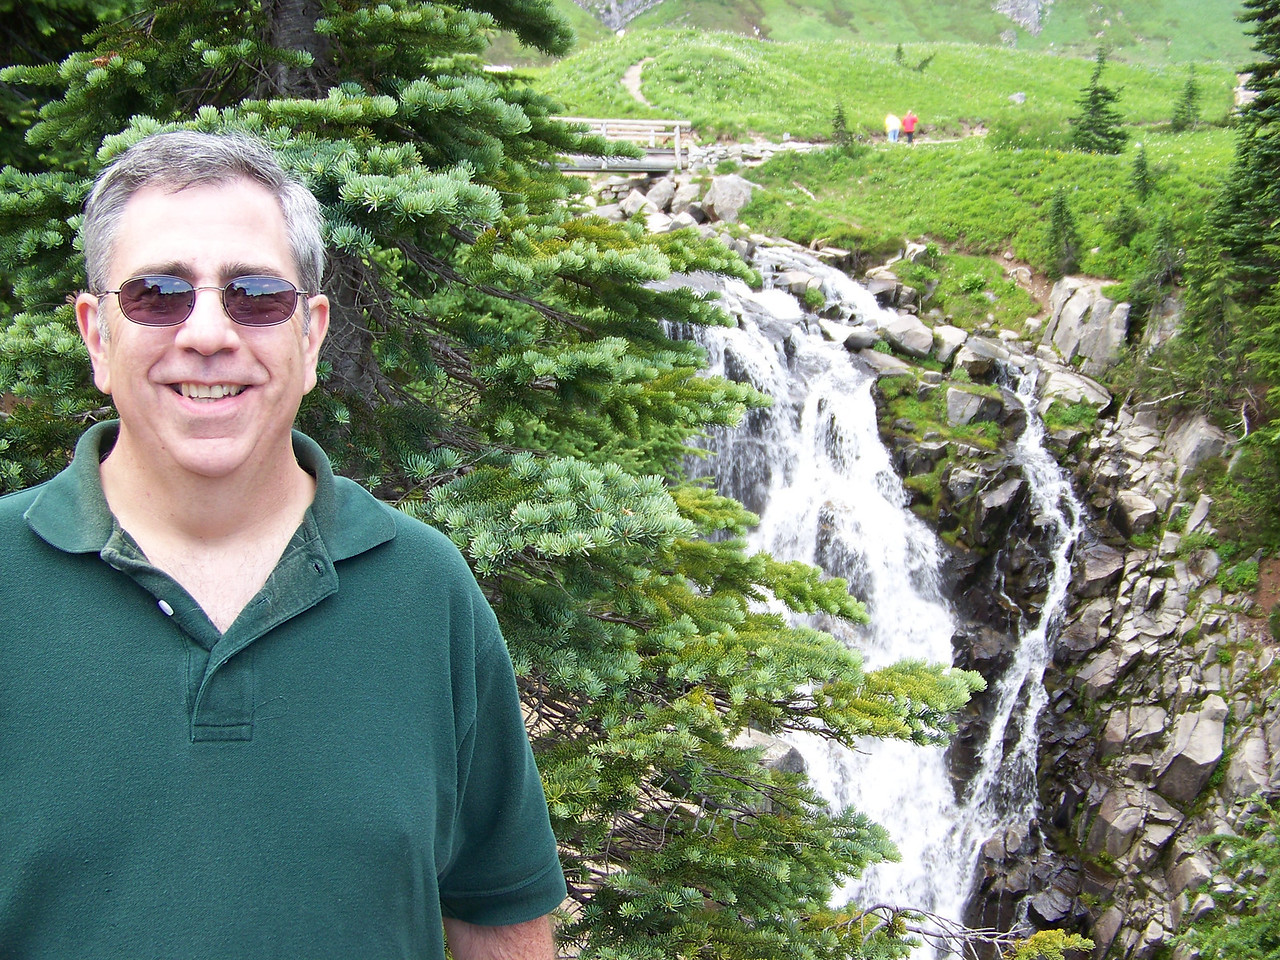 Dave at Myrtle Falls.